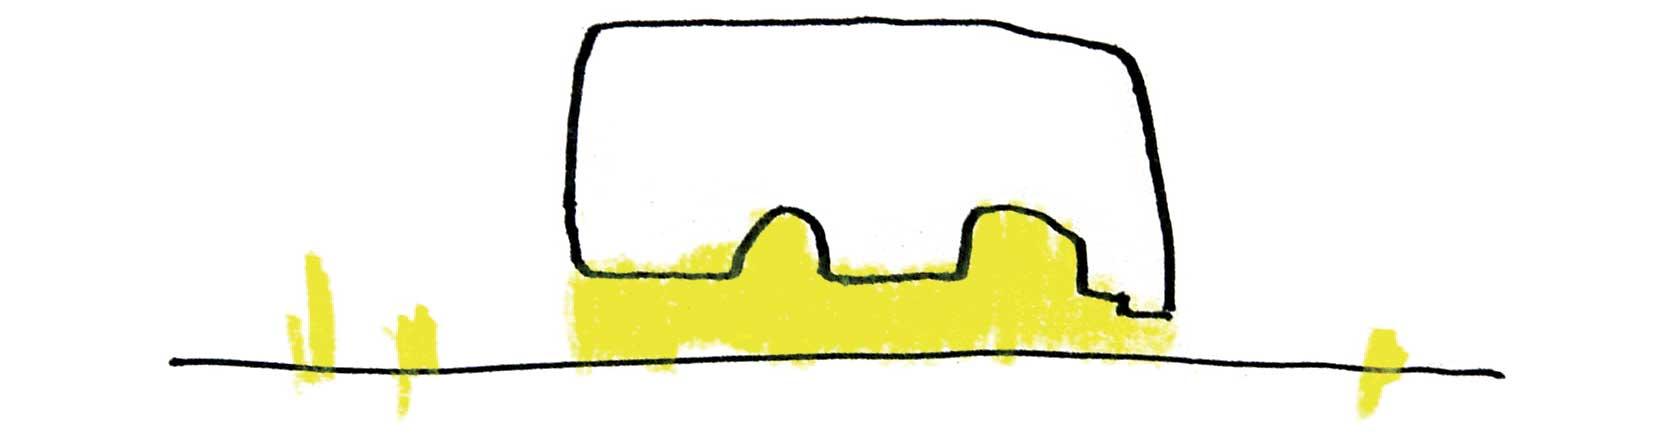 WIB.Link: Sketch